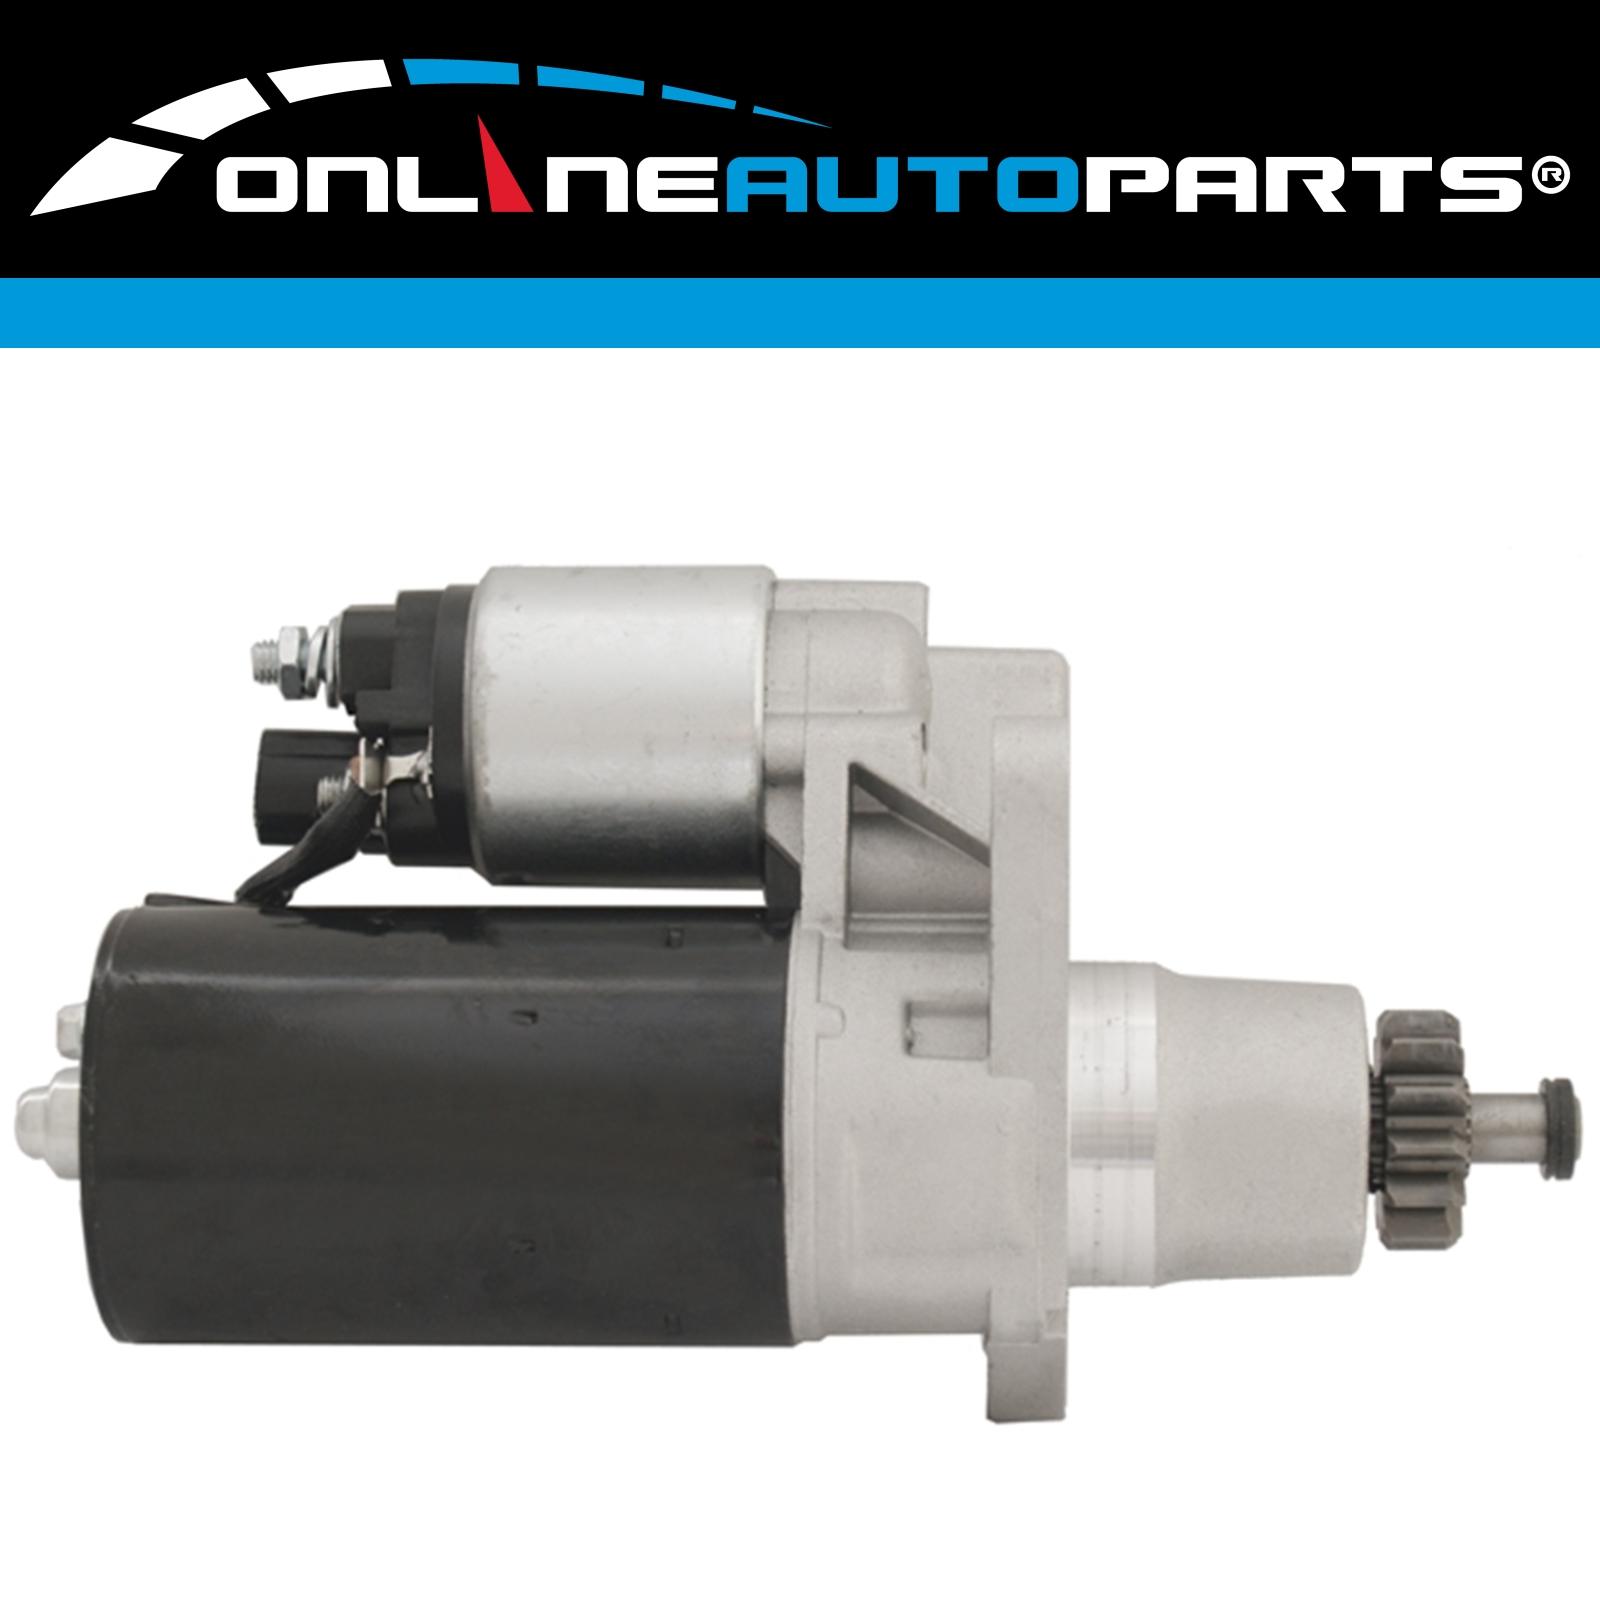 New Starter Motor fits Toyota Aurion 2GR-FE 3.5L V6 Petrol 2006-2012